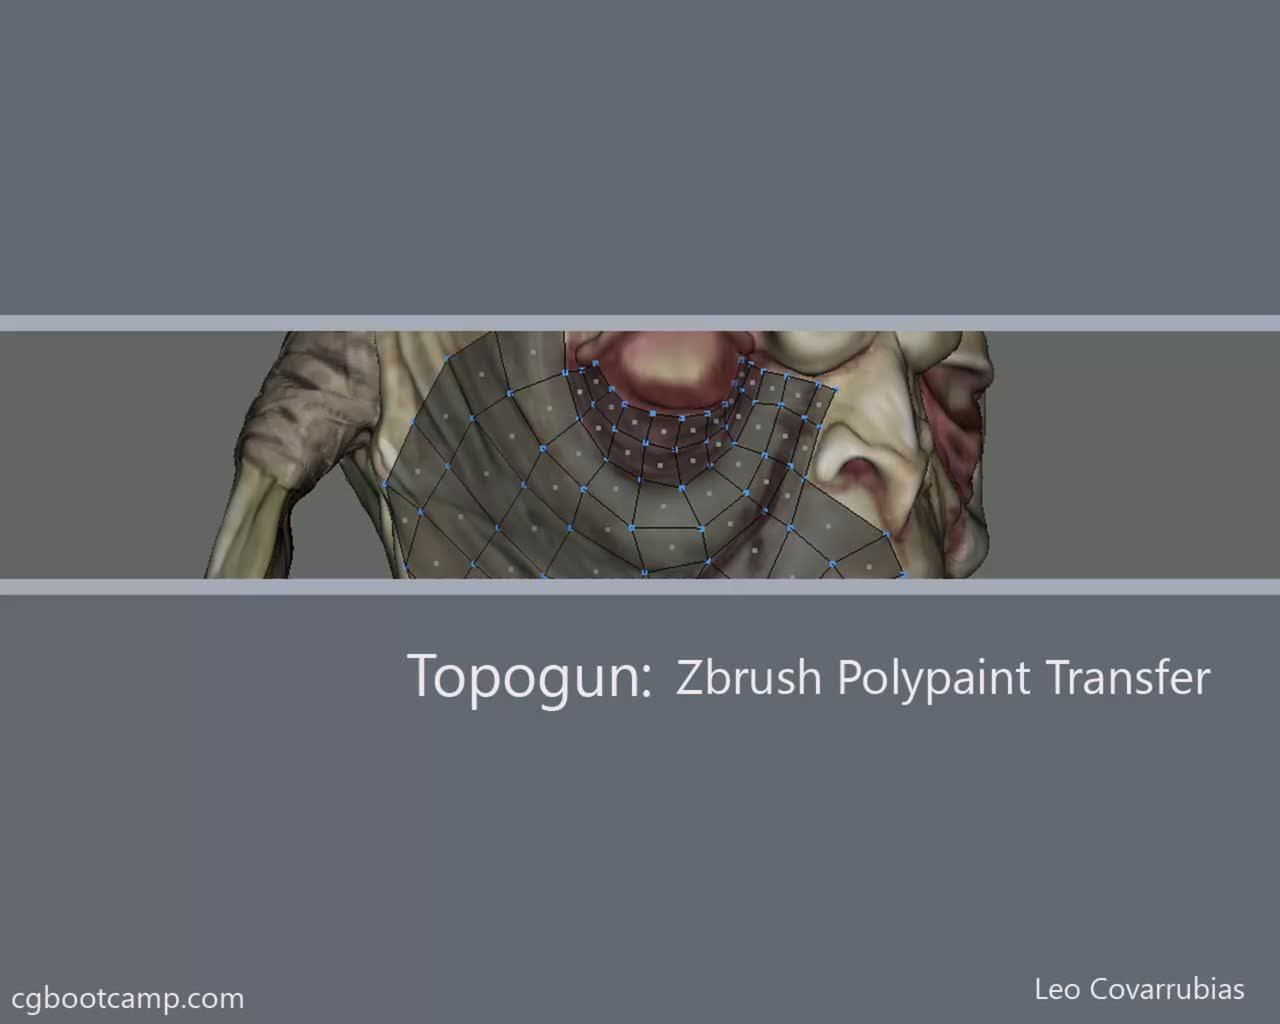 Topogun Zbrush Polypaint Transfer Zbrush Zbrush Tutorial Art Tutorials